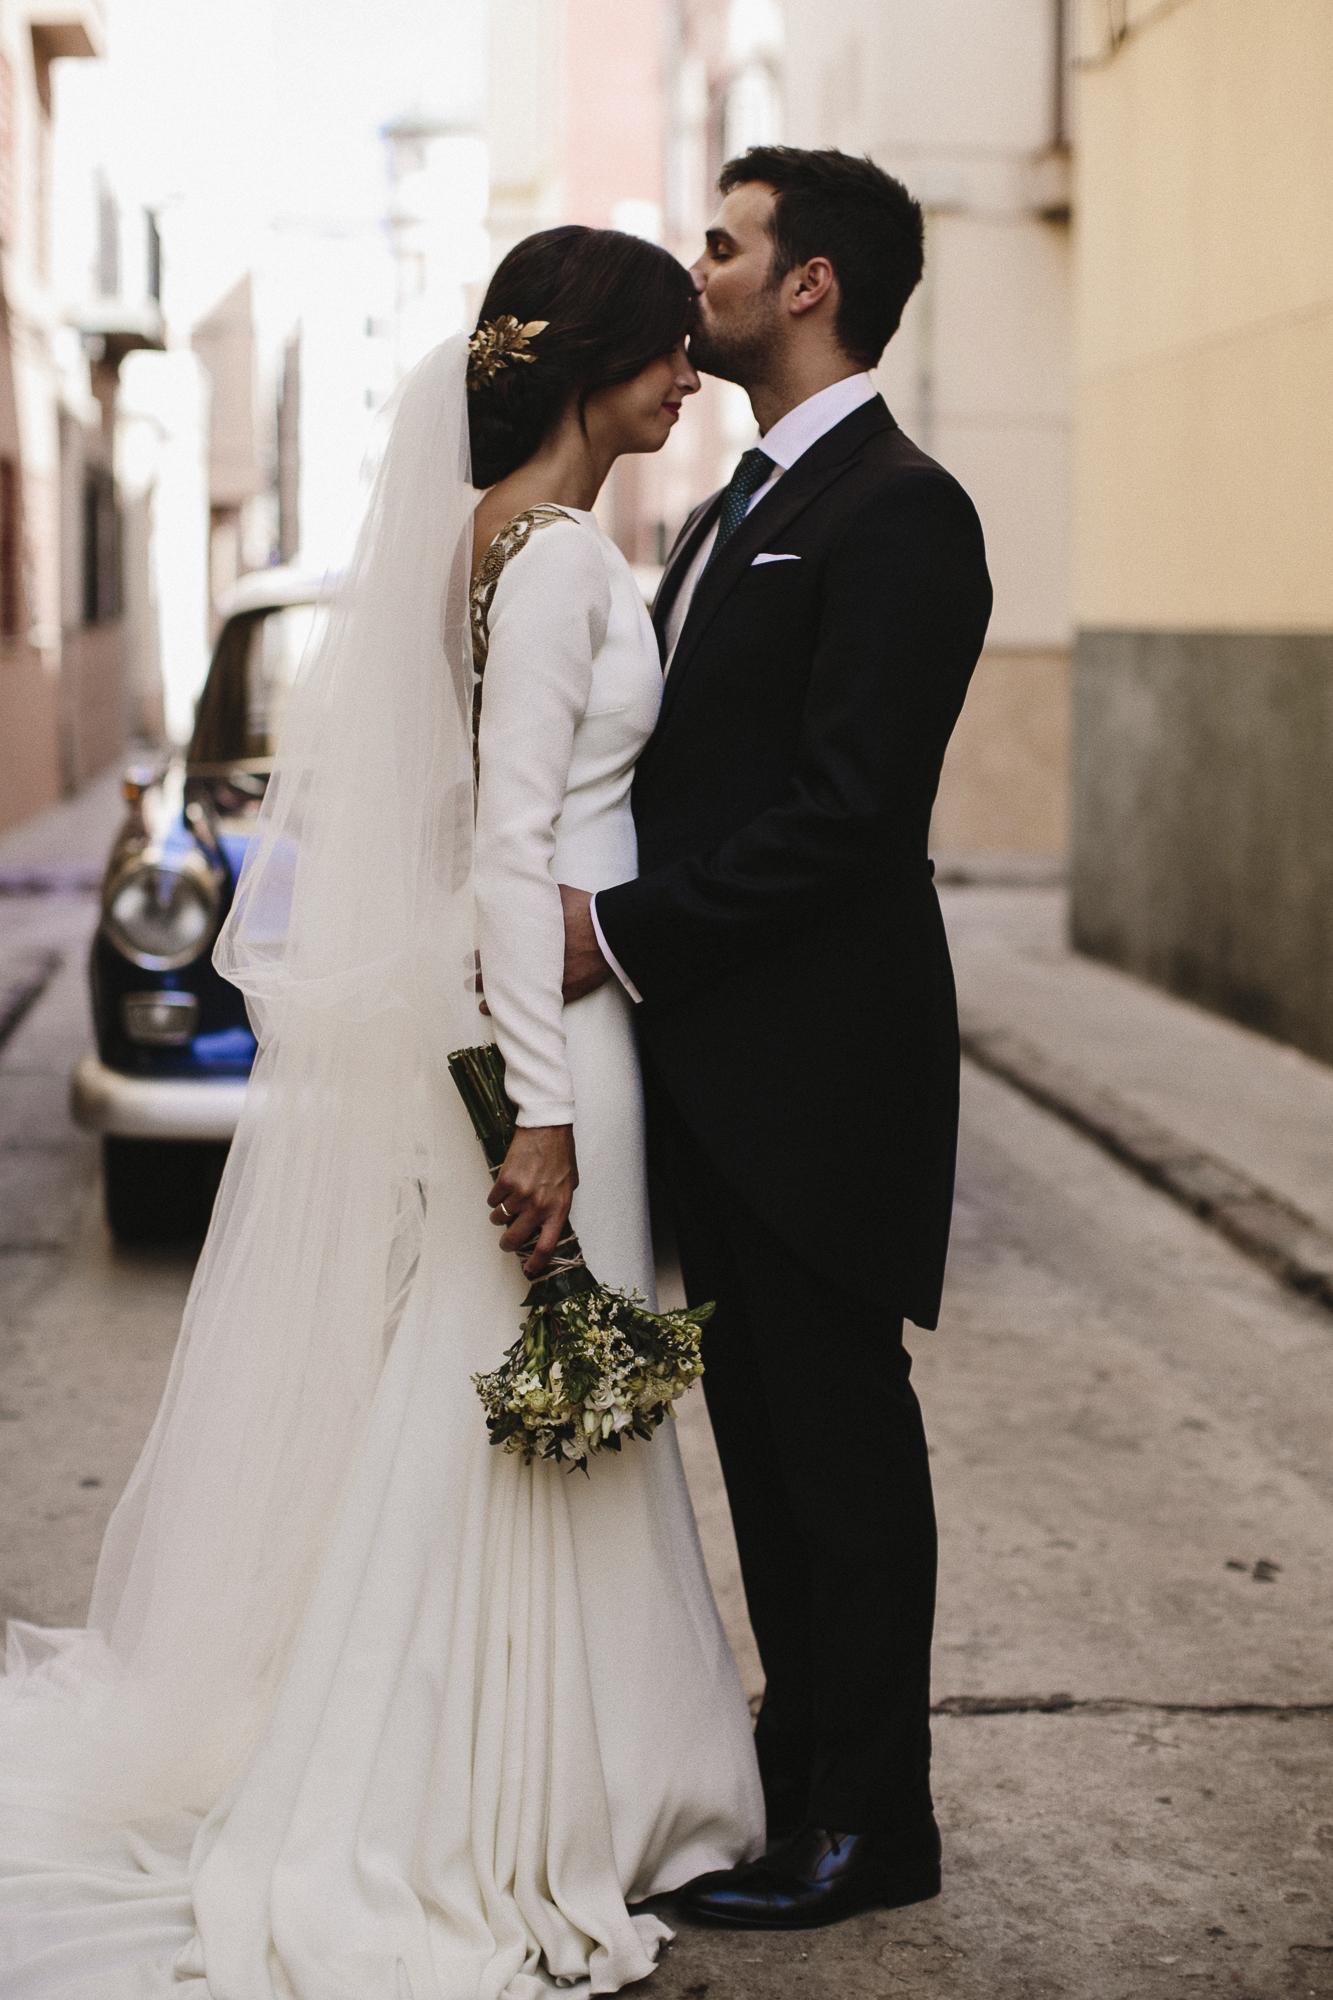 alfonso_flores_destination_wedding_photogrpaher_españa-73.jpg